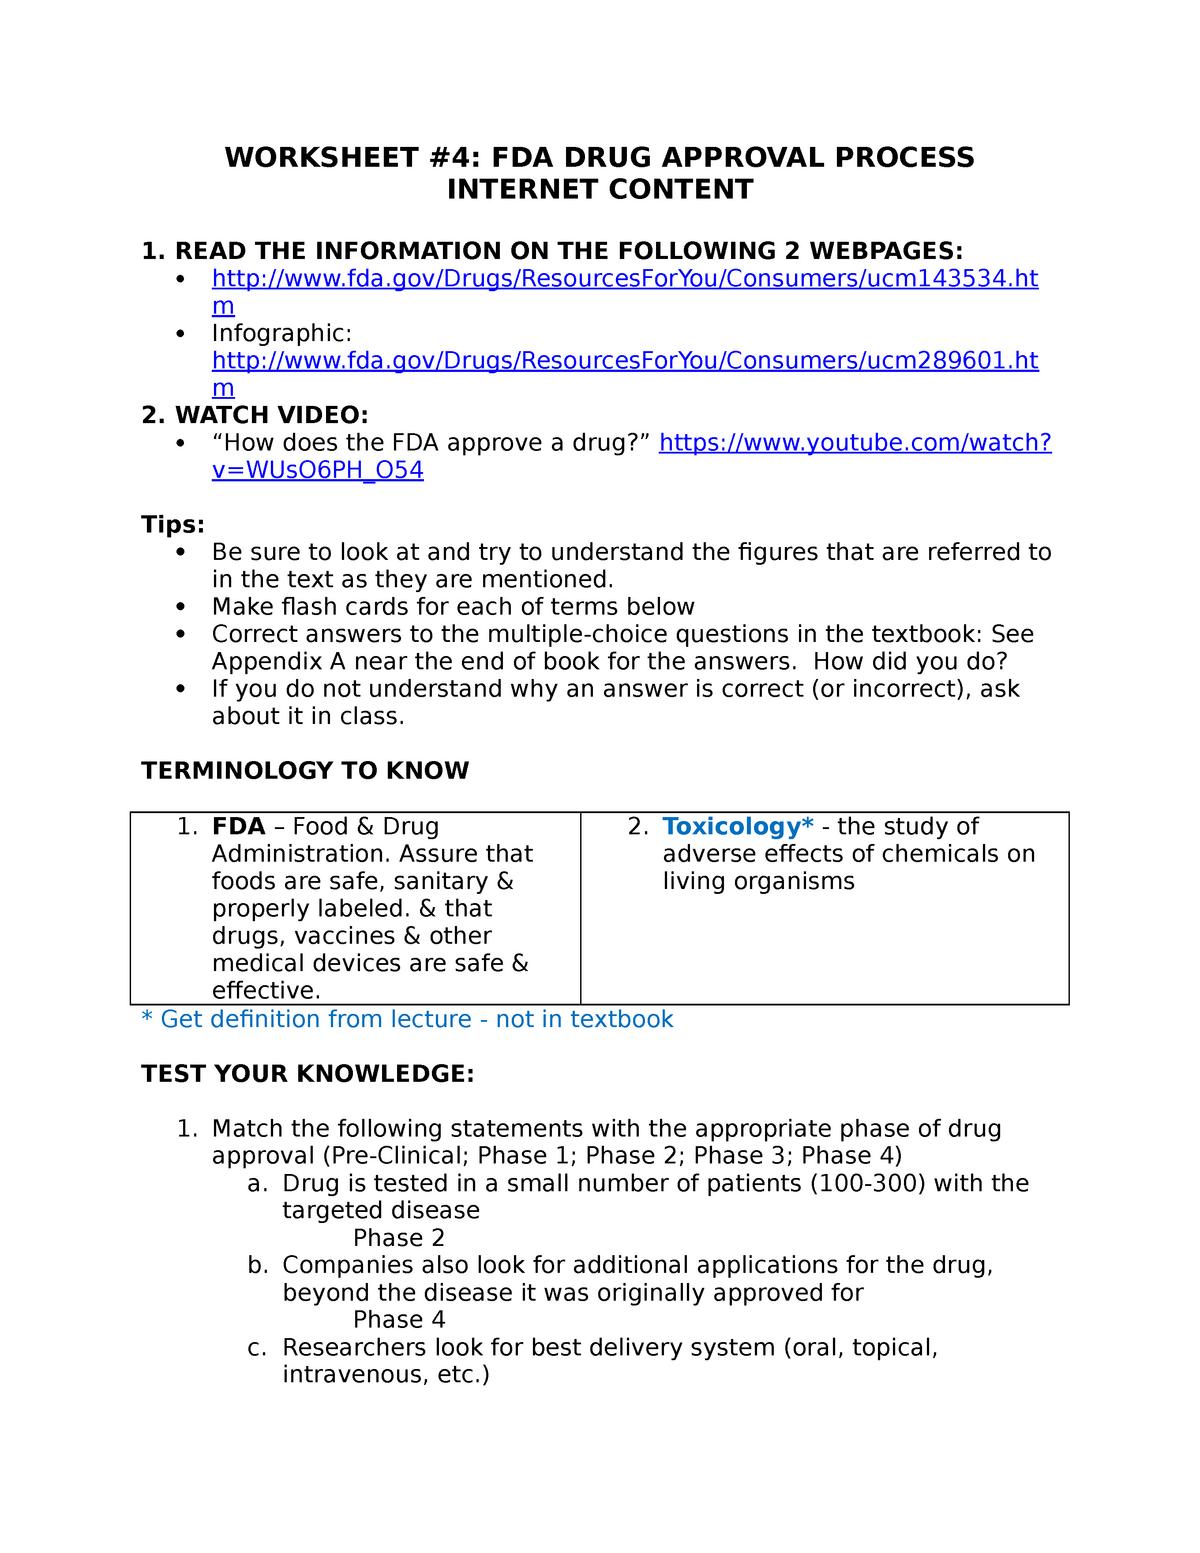 BIO A4 worksheet - Professor Greg Dahlem - BIO 120 - NKU